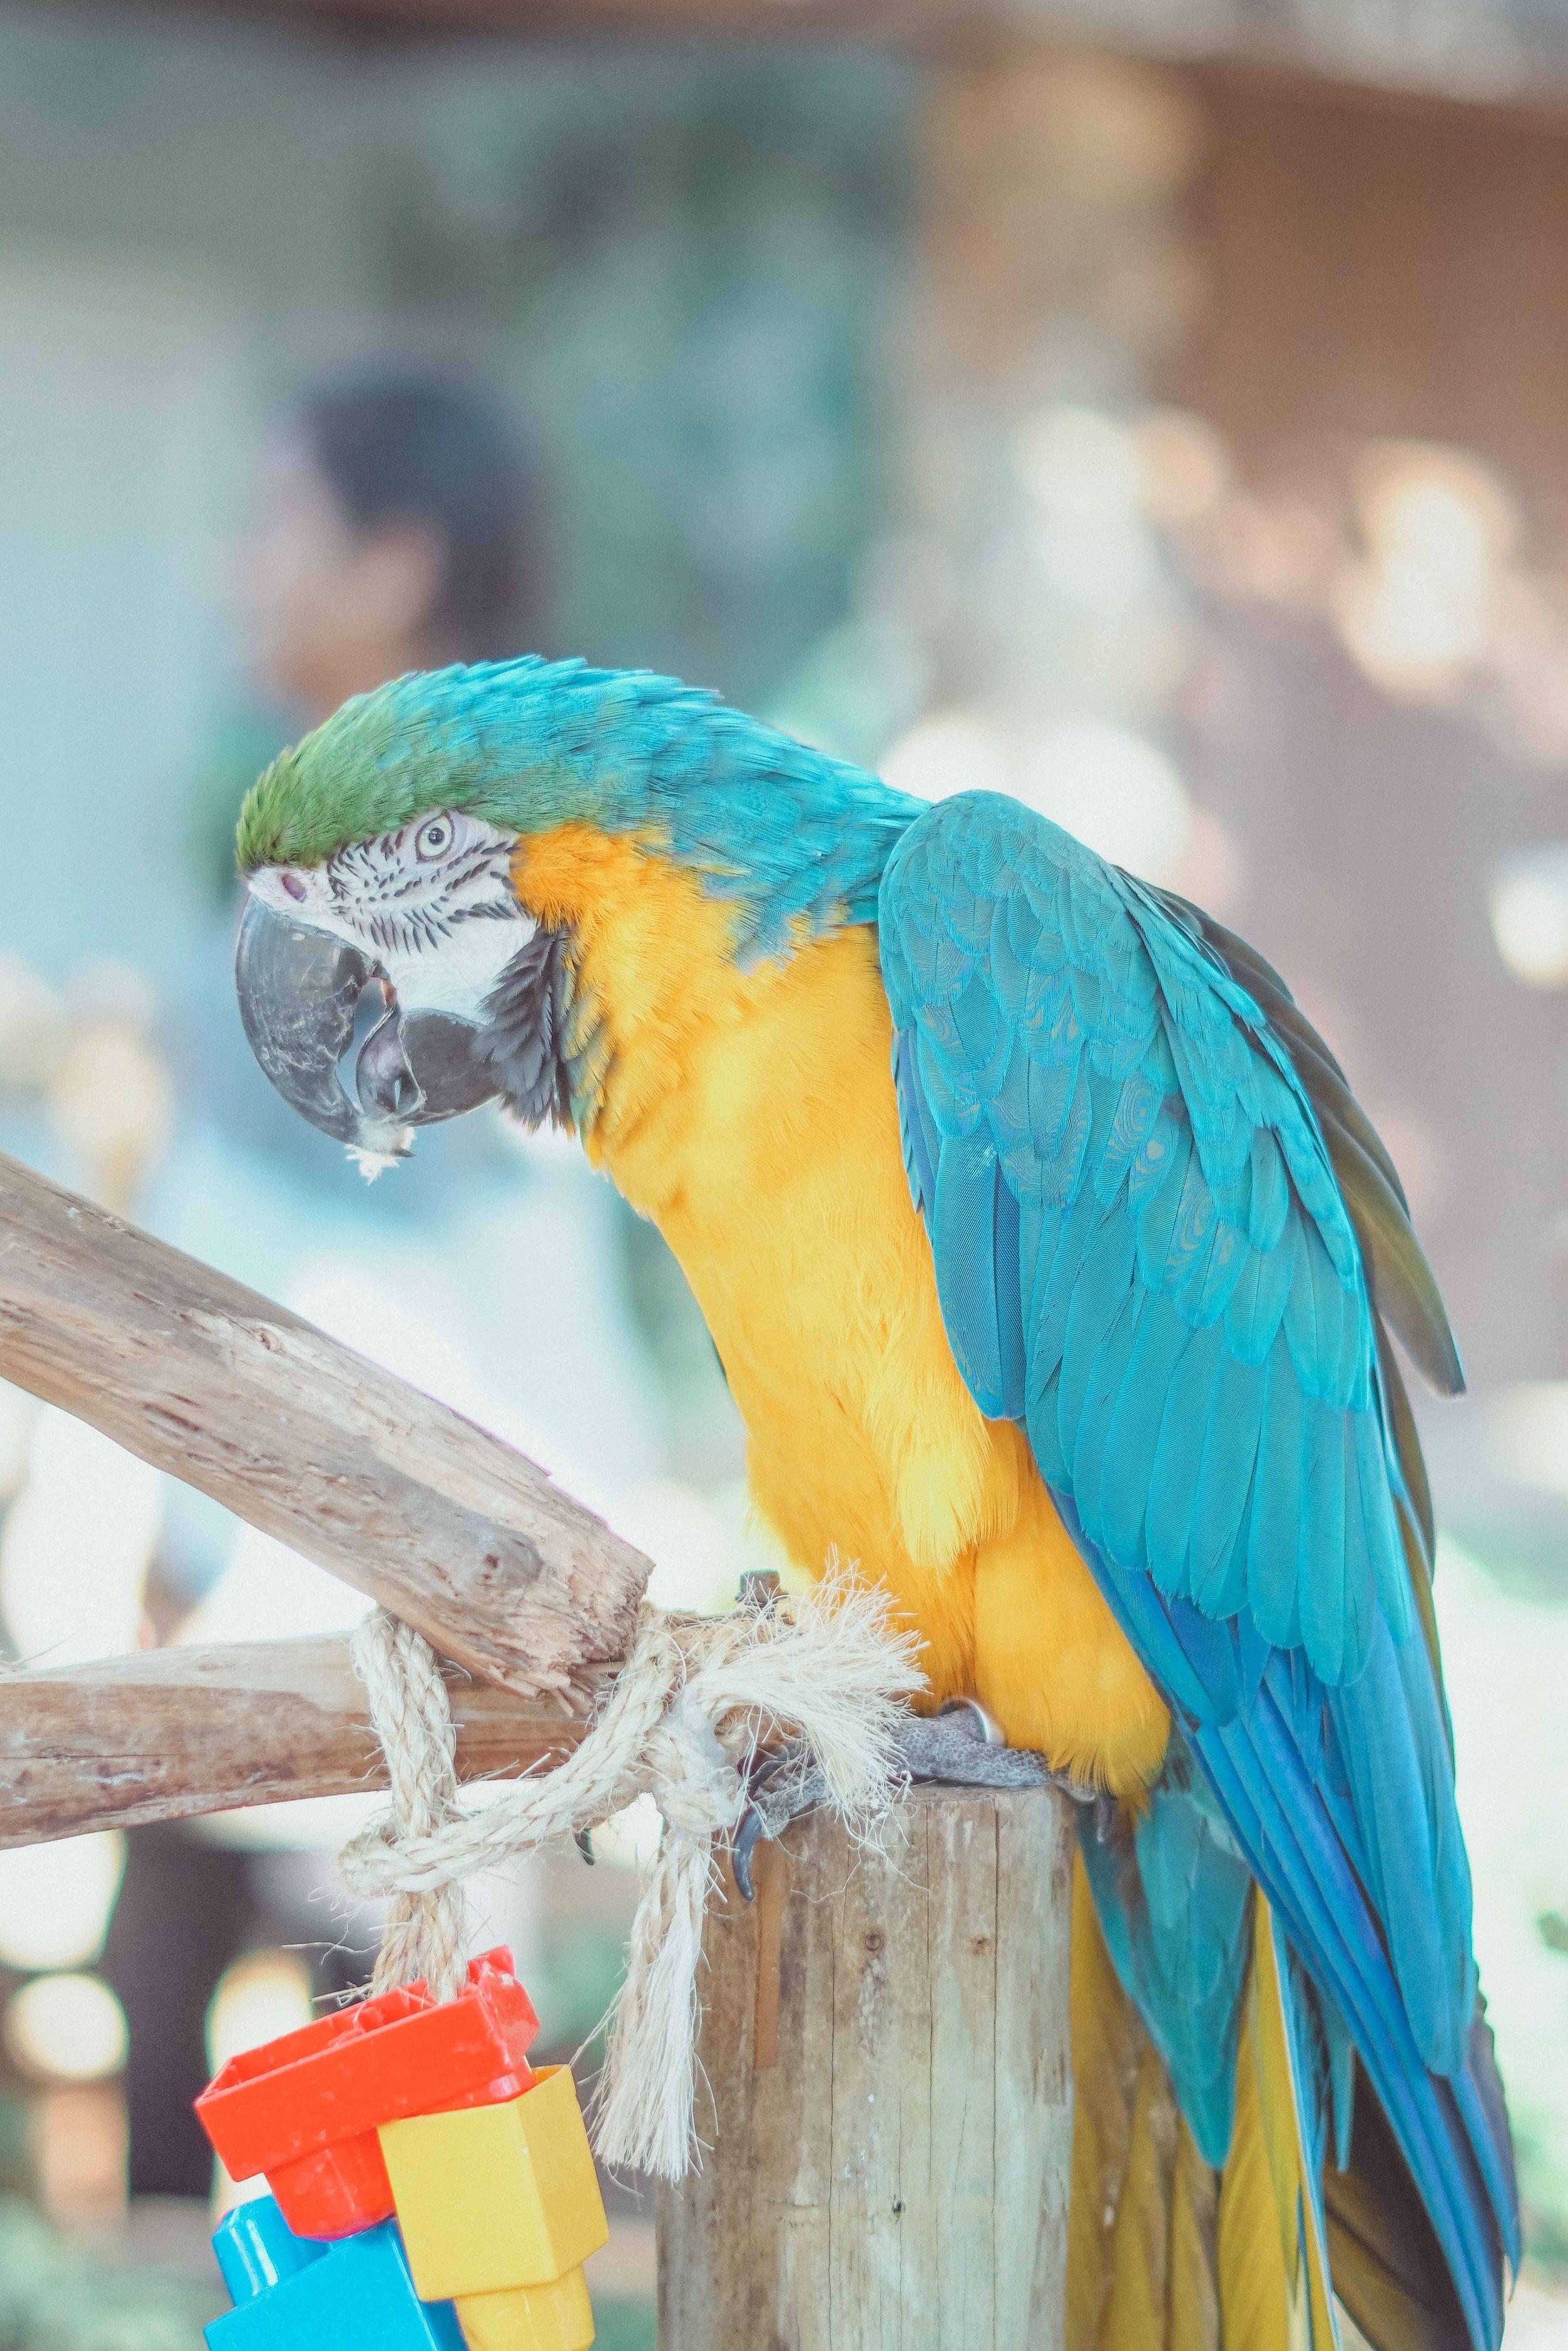 free stock photo example parrot.jpg